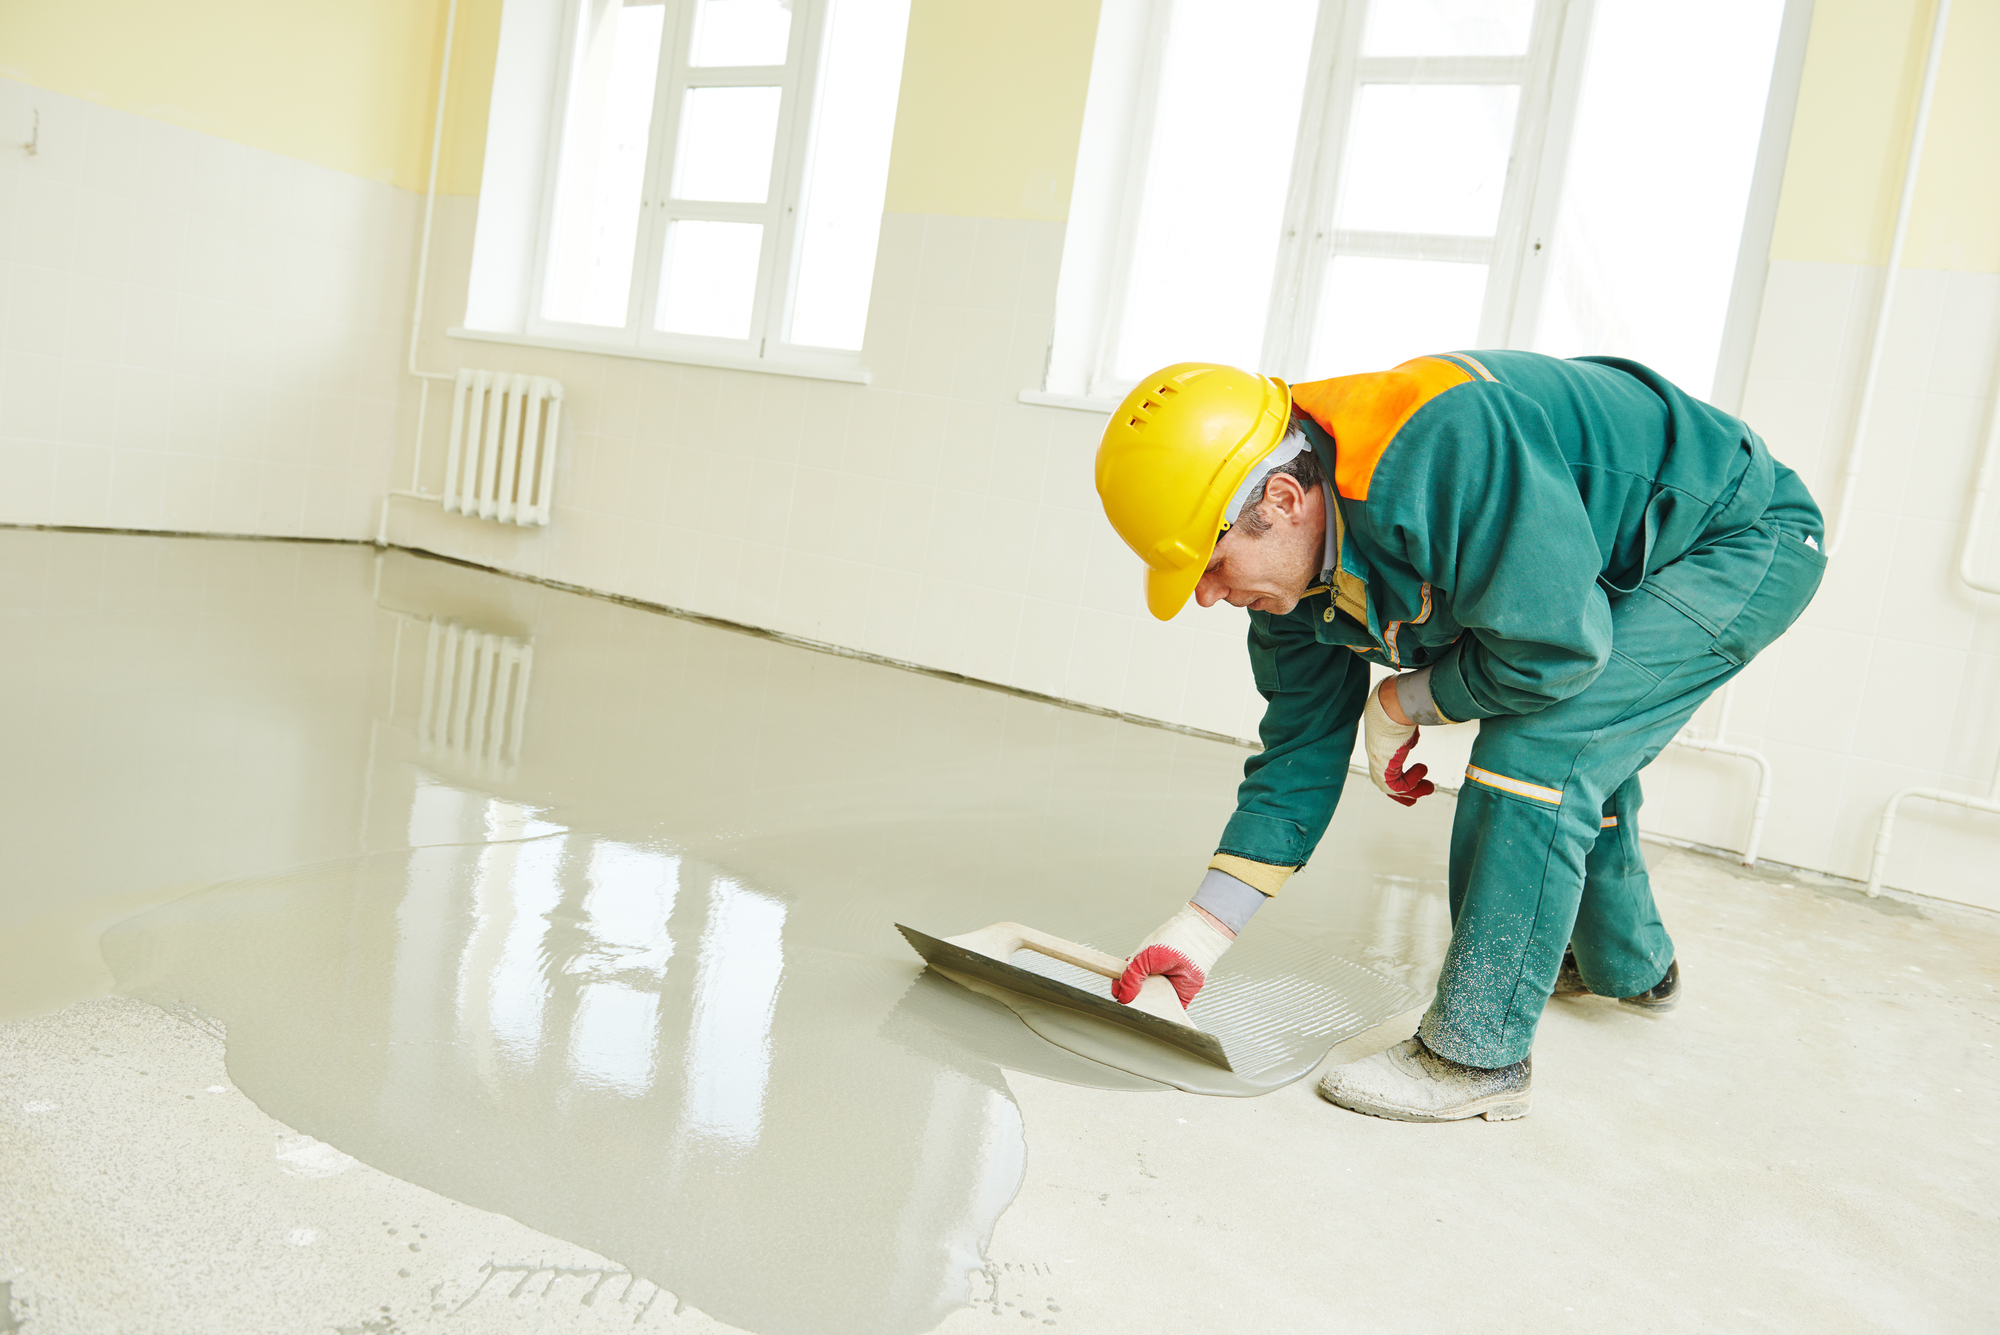 How to repair an epoxy floor coating